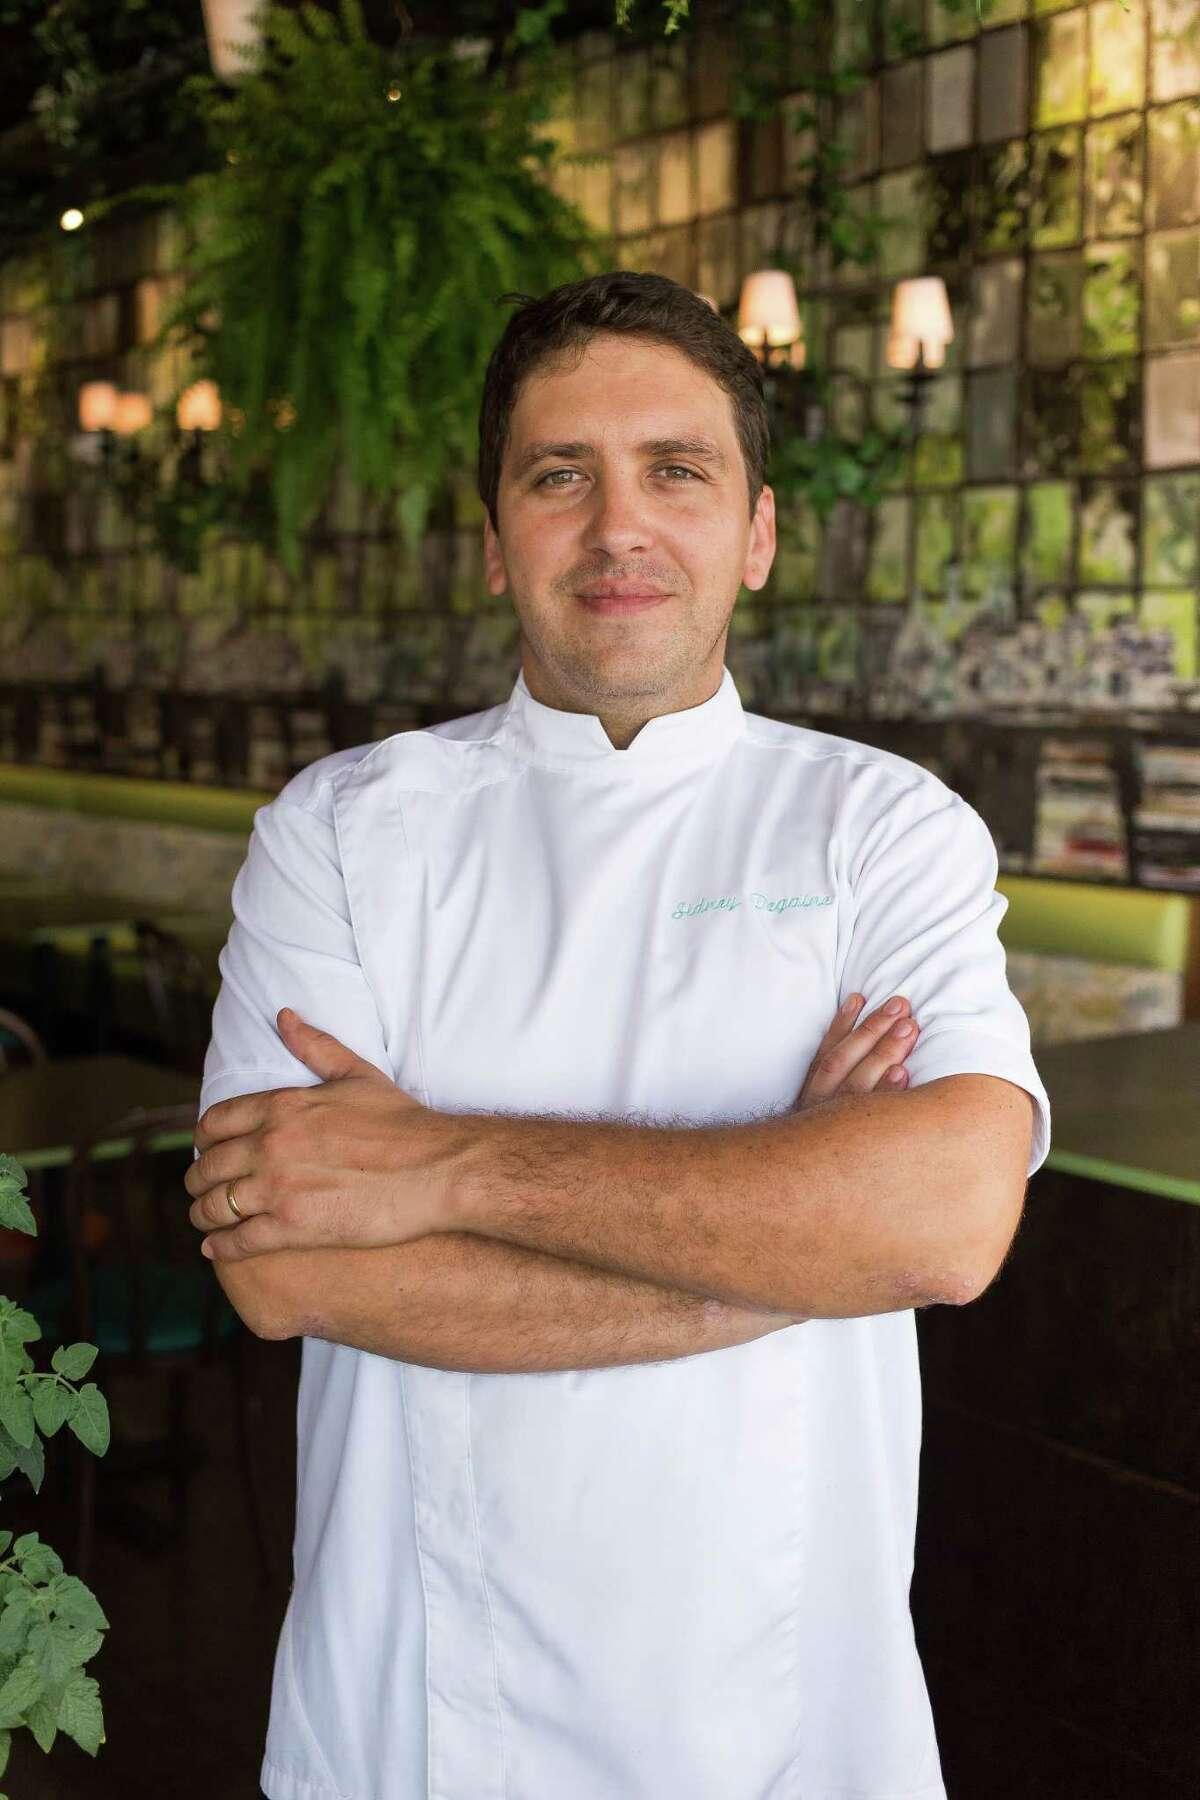 Chef Sidkey Degaine has opened a new fast-casual restaurant in Katy called Mona Fresh Italian Food.